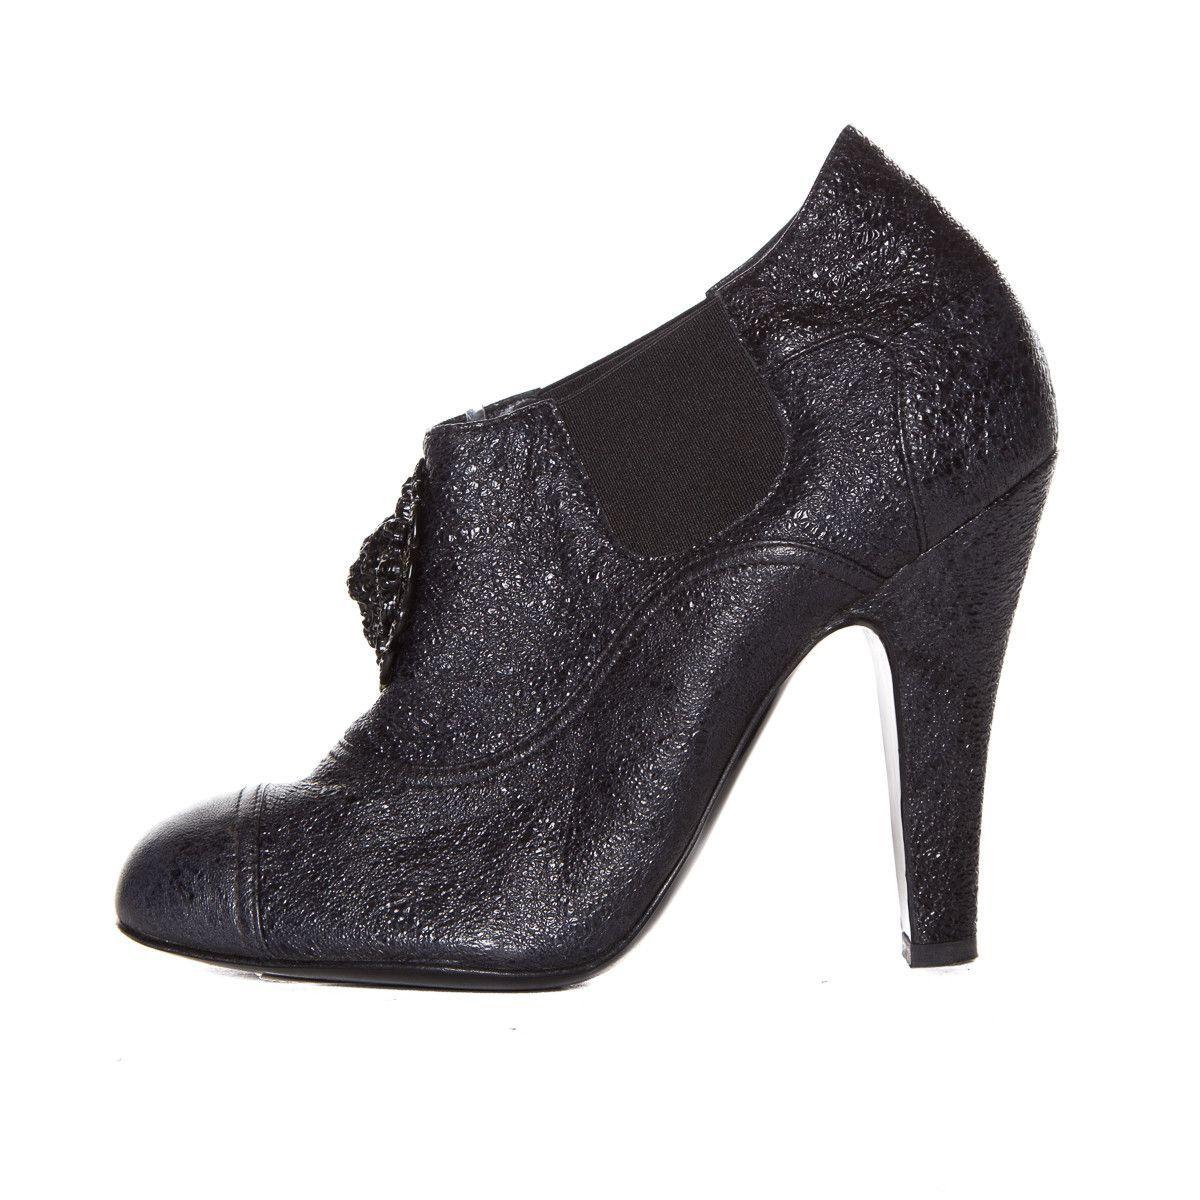 Chanel Black Crinkle Leather Booties SZ 38